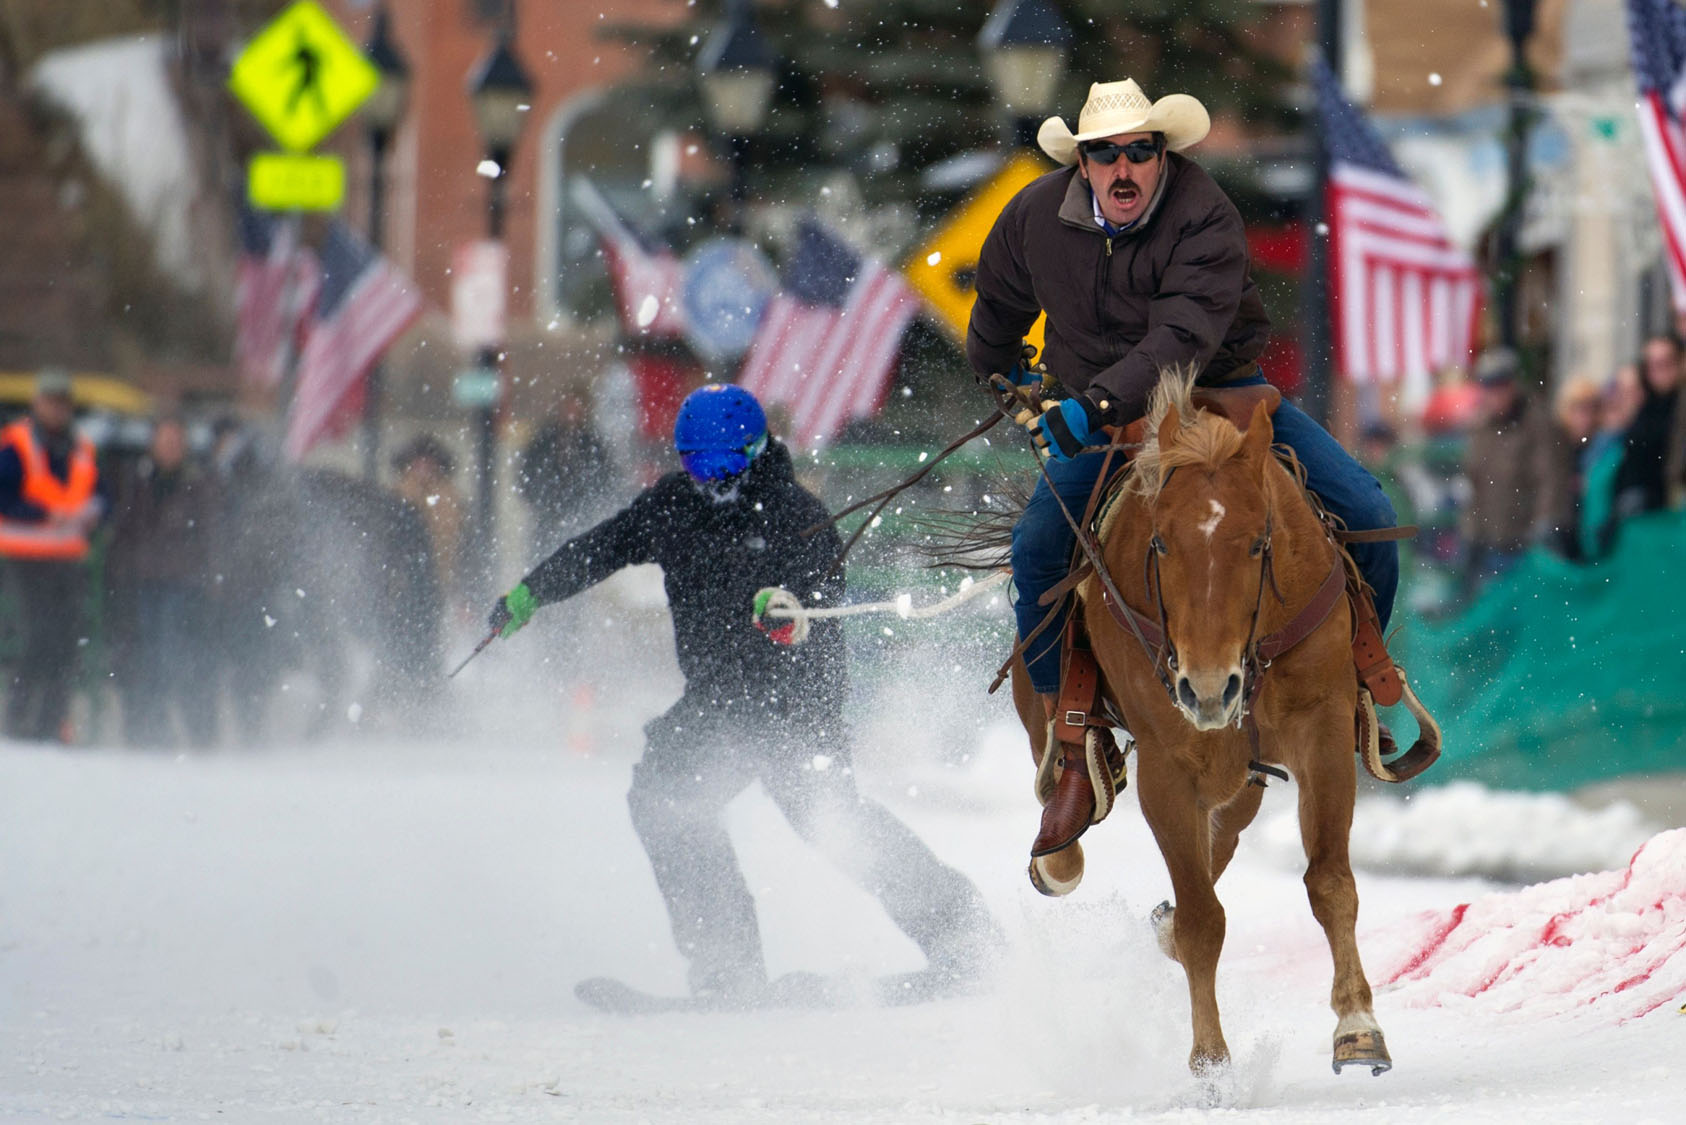 68th annual Leadville Ski Joring competition in Colorado